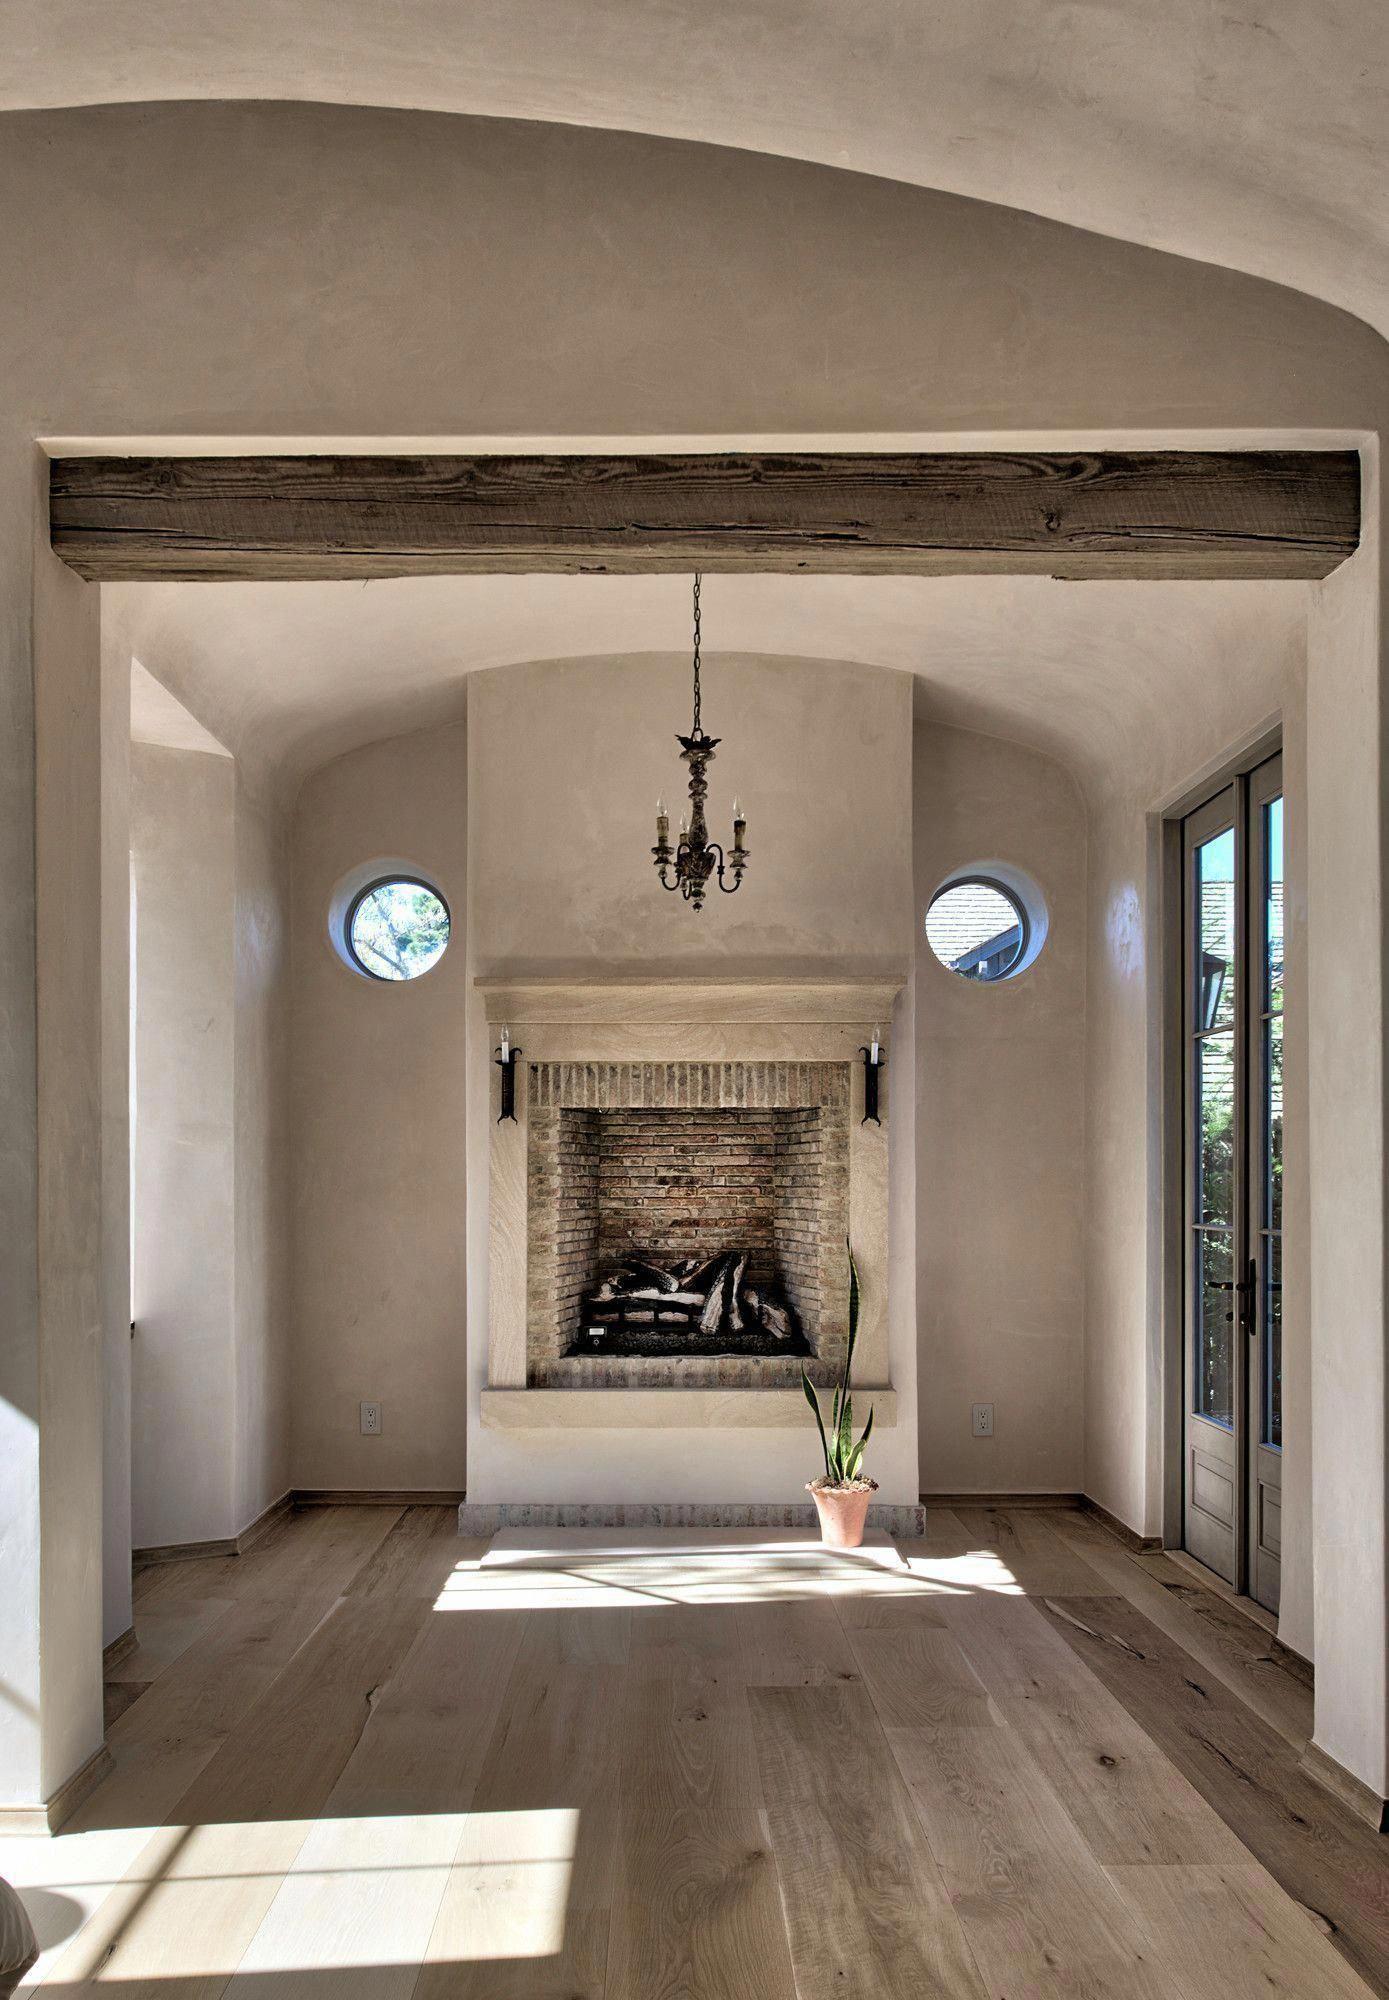 Raised Ranch Living Room Design: Dining Room With Raised Fireplace. Markcristofalo